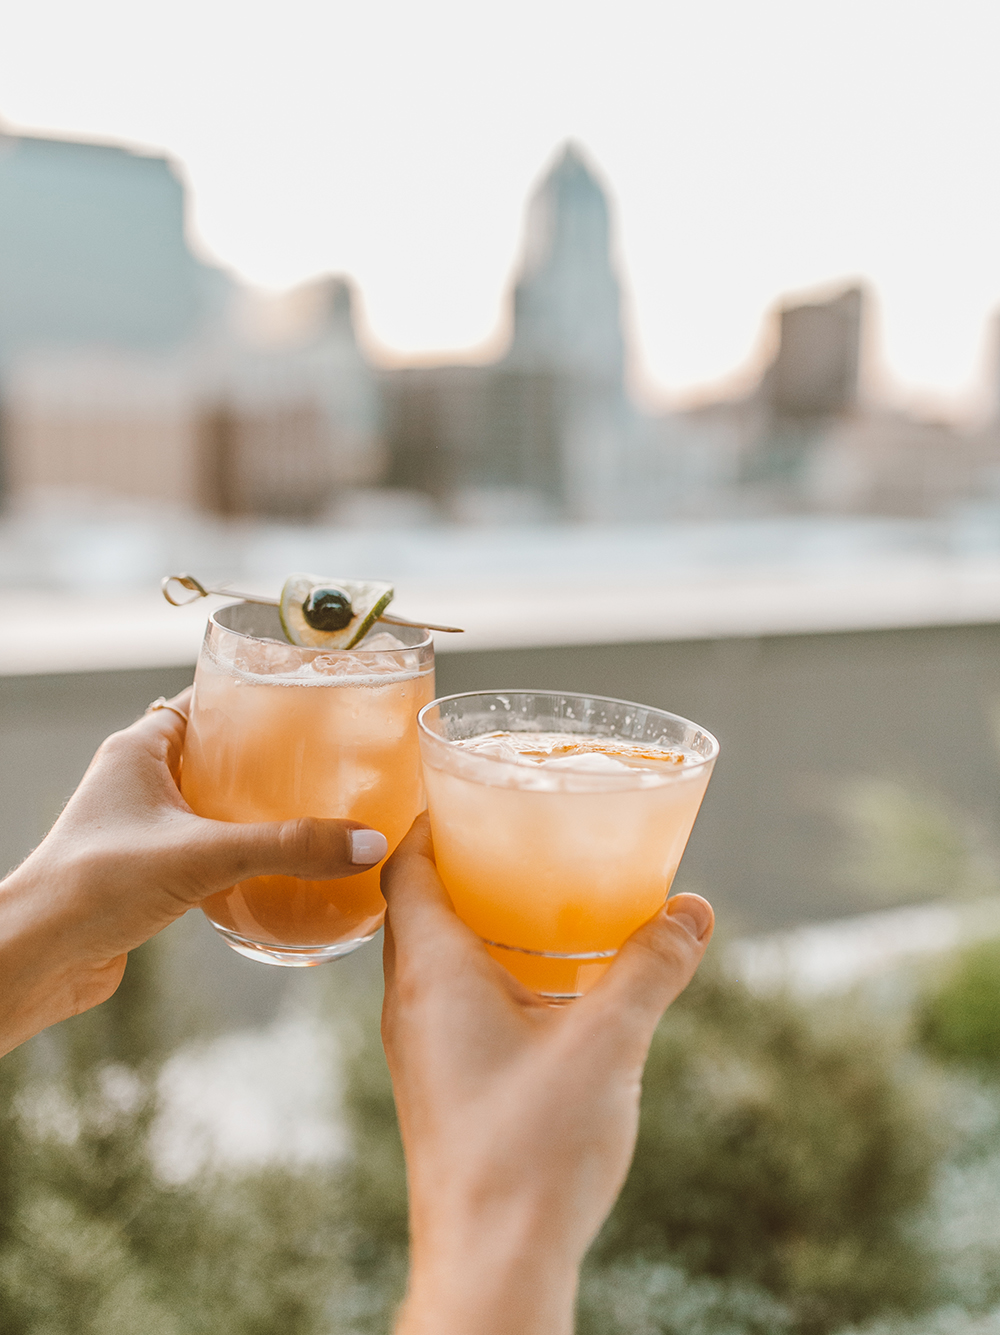 livvyland-blog-olivia-watson-austin-texas-lifestyle-blogger-fairmont-hotel-atx-downtown-rooftop-pool-cocktail